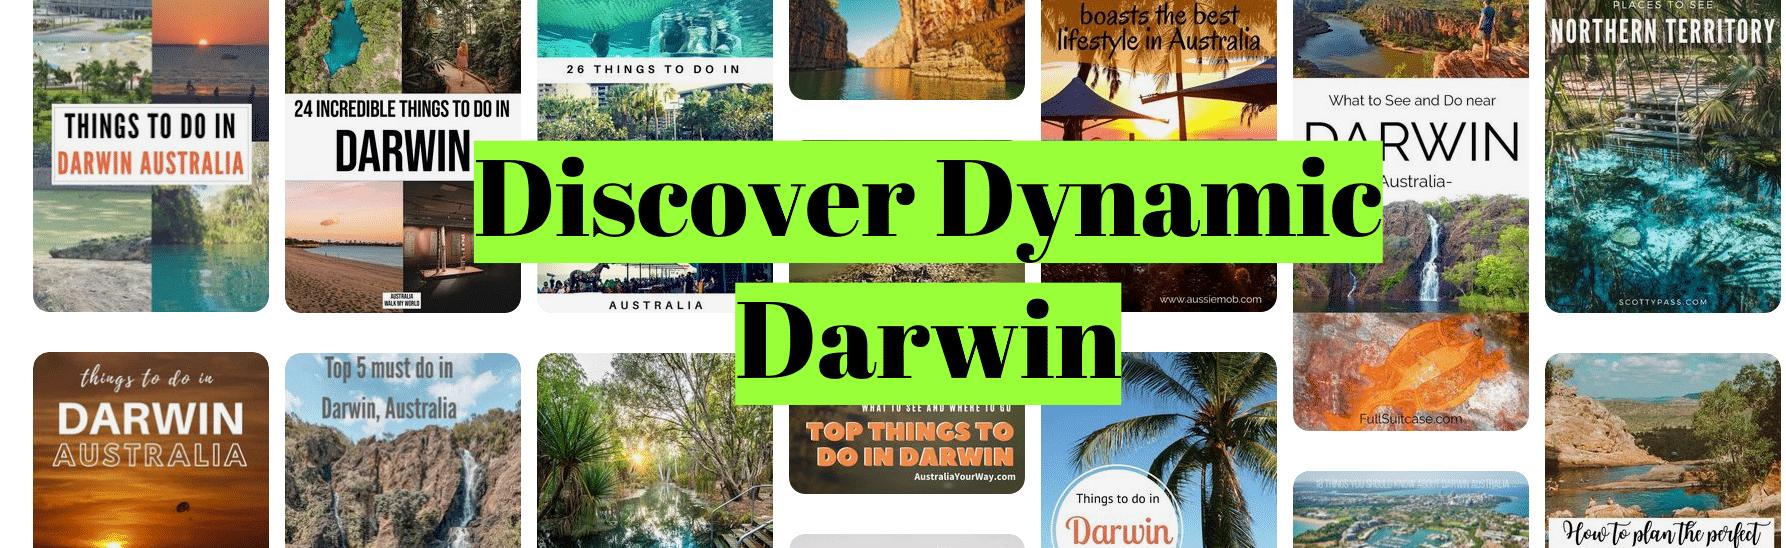 Discover Dynamic Darwin